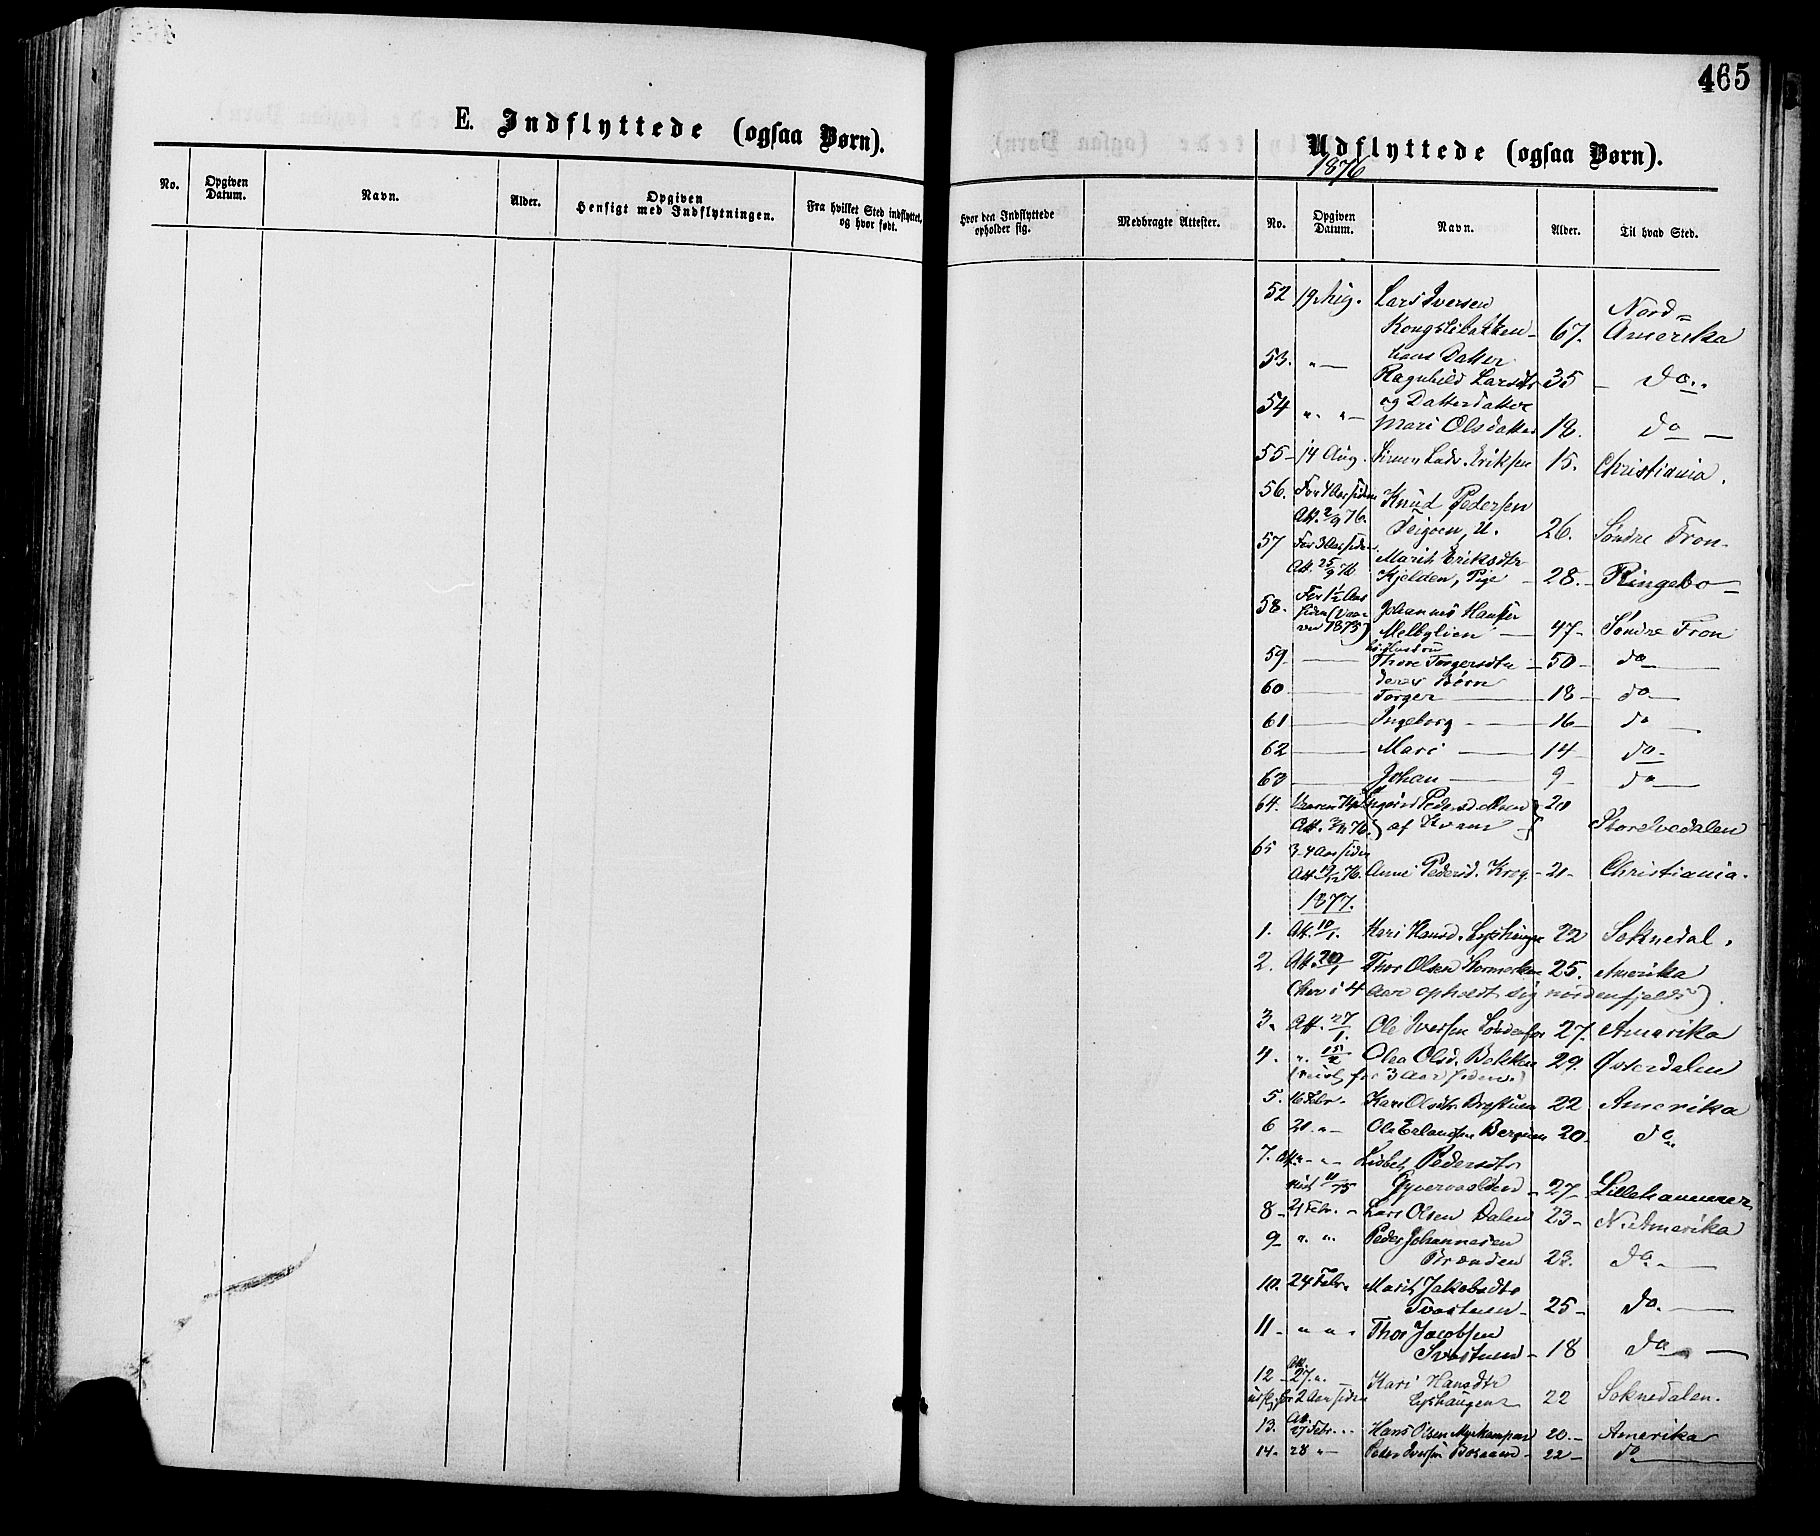 SAH, Nord-Fron prestekontor, Ministerialbok nr. 2, 1865-1883, s. 465